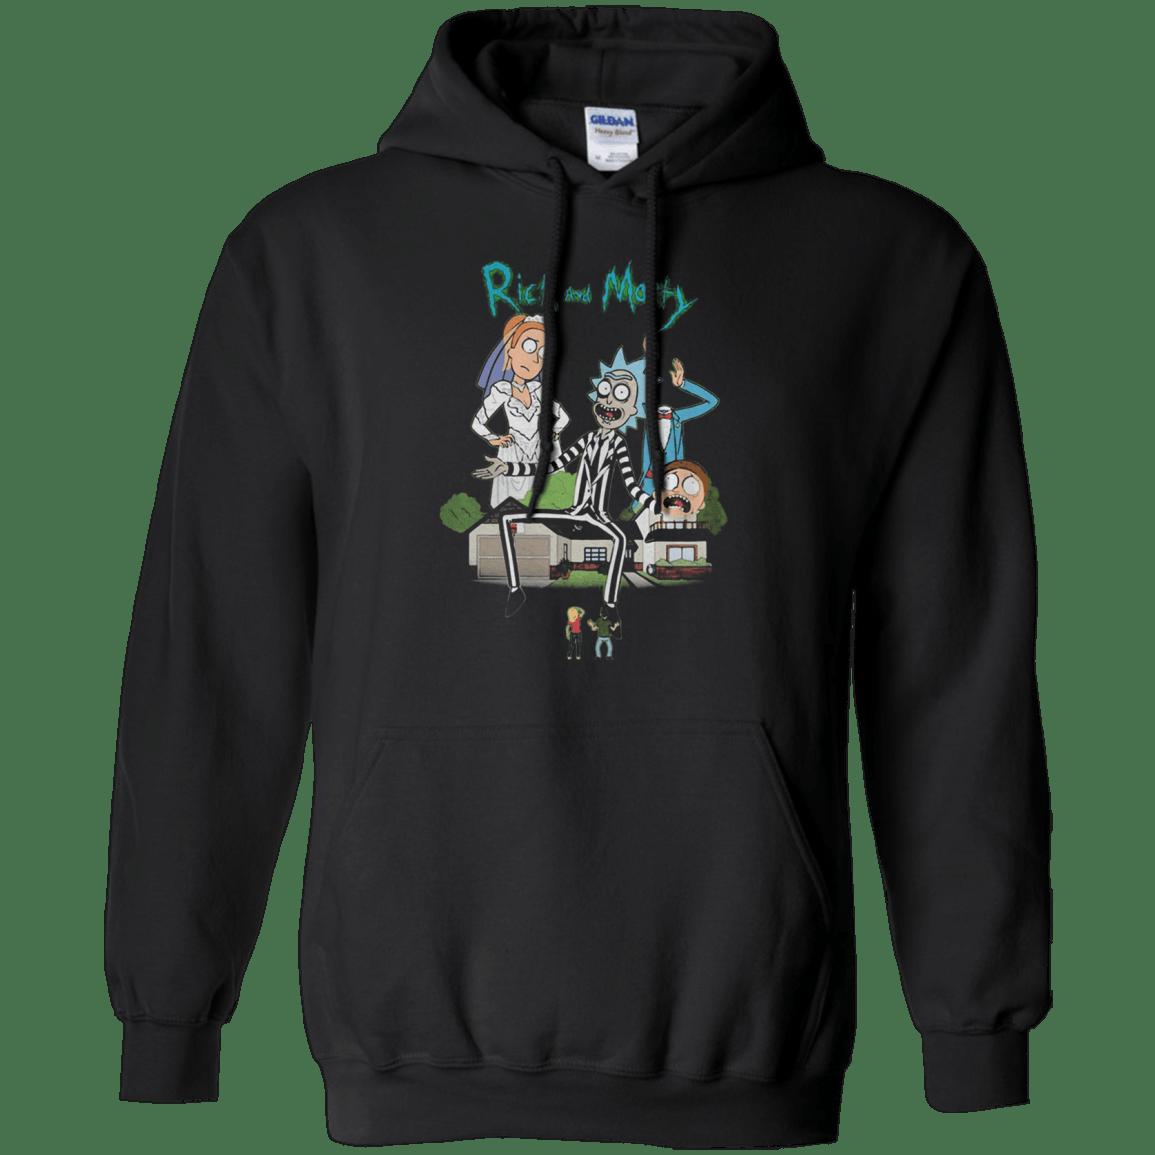 Rick And Morty Beetlejuice Printed G185 Gildan Pullover Hoodie 8 oz